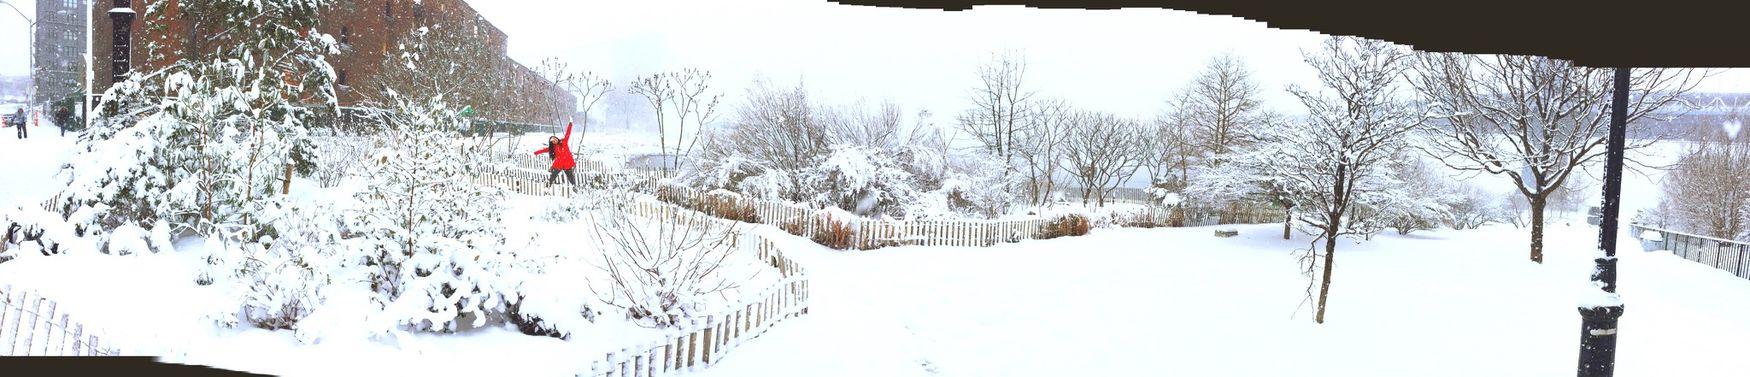 NYC snow loveit